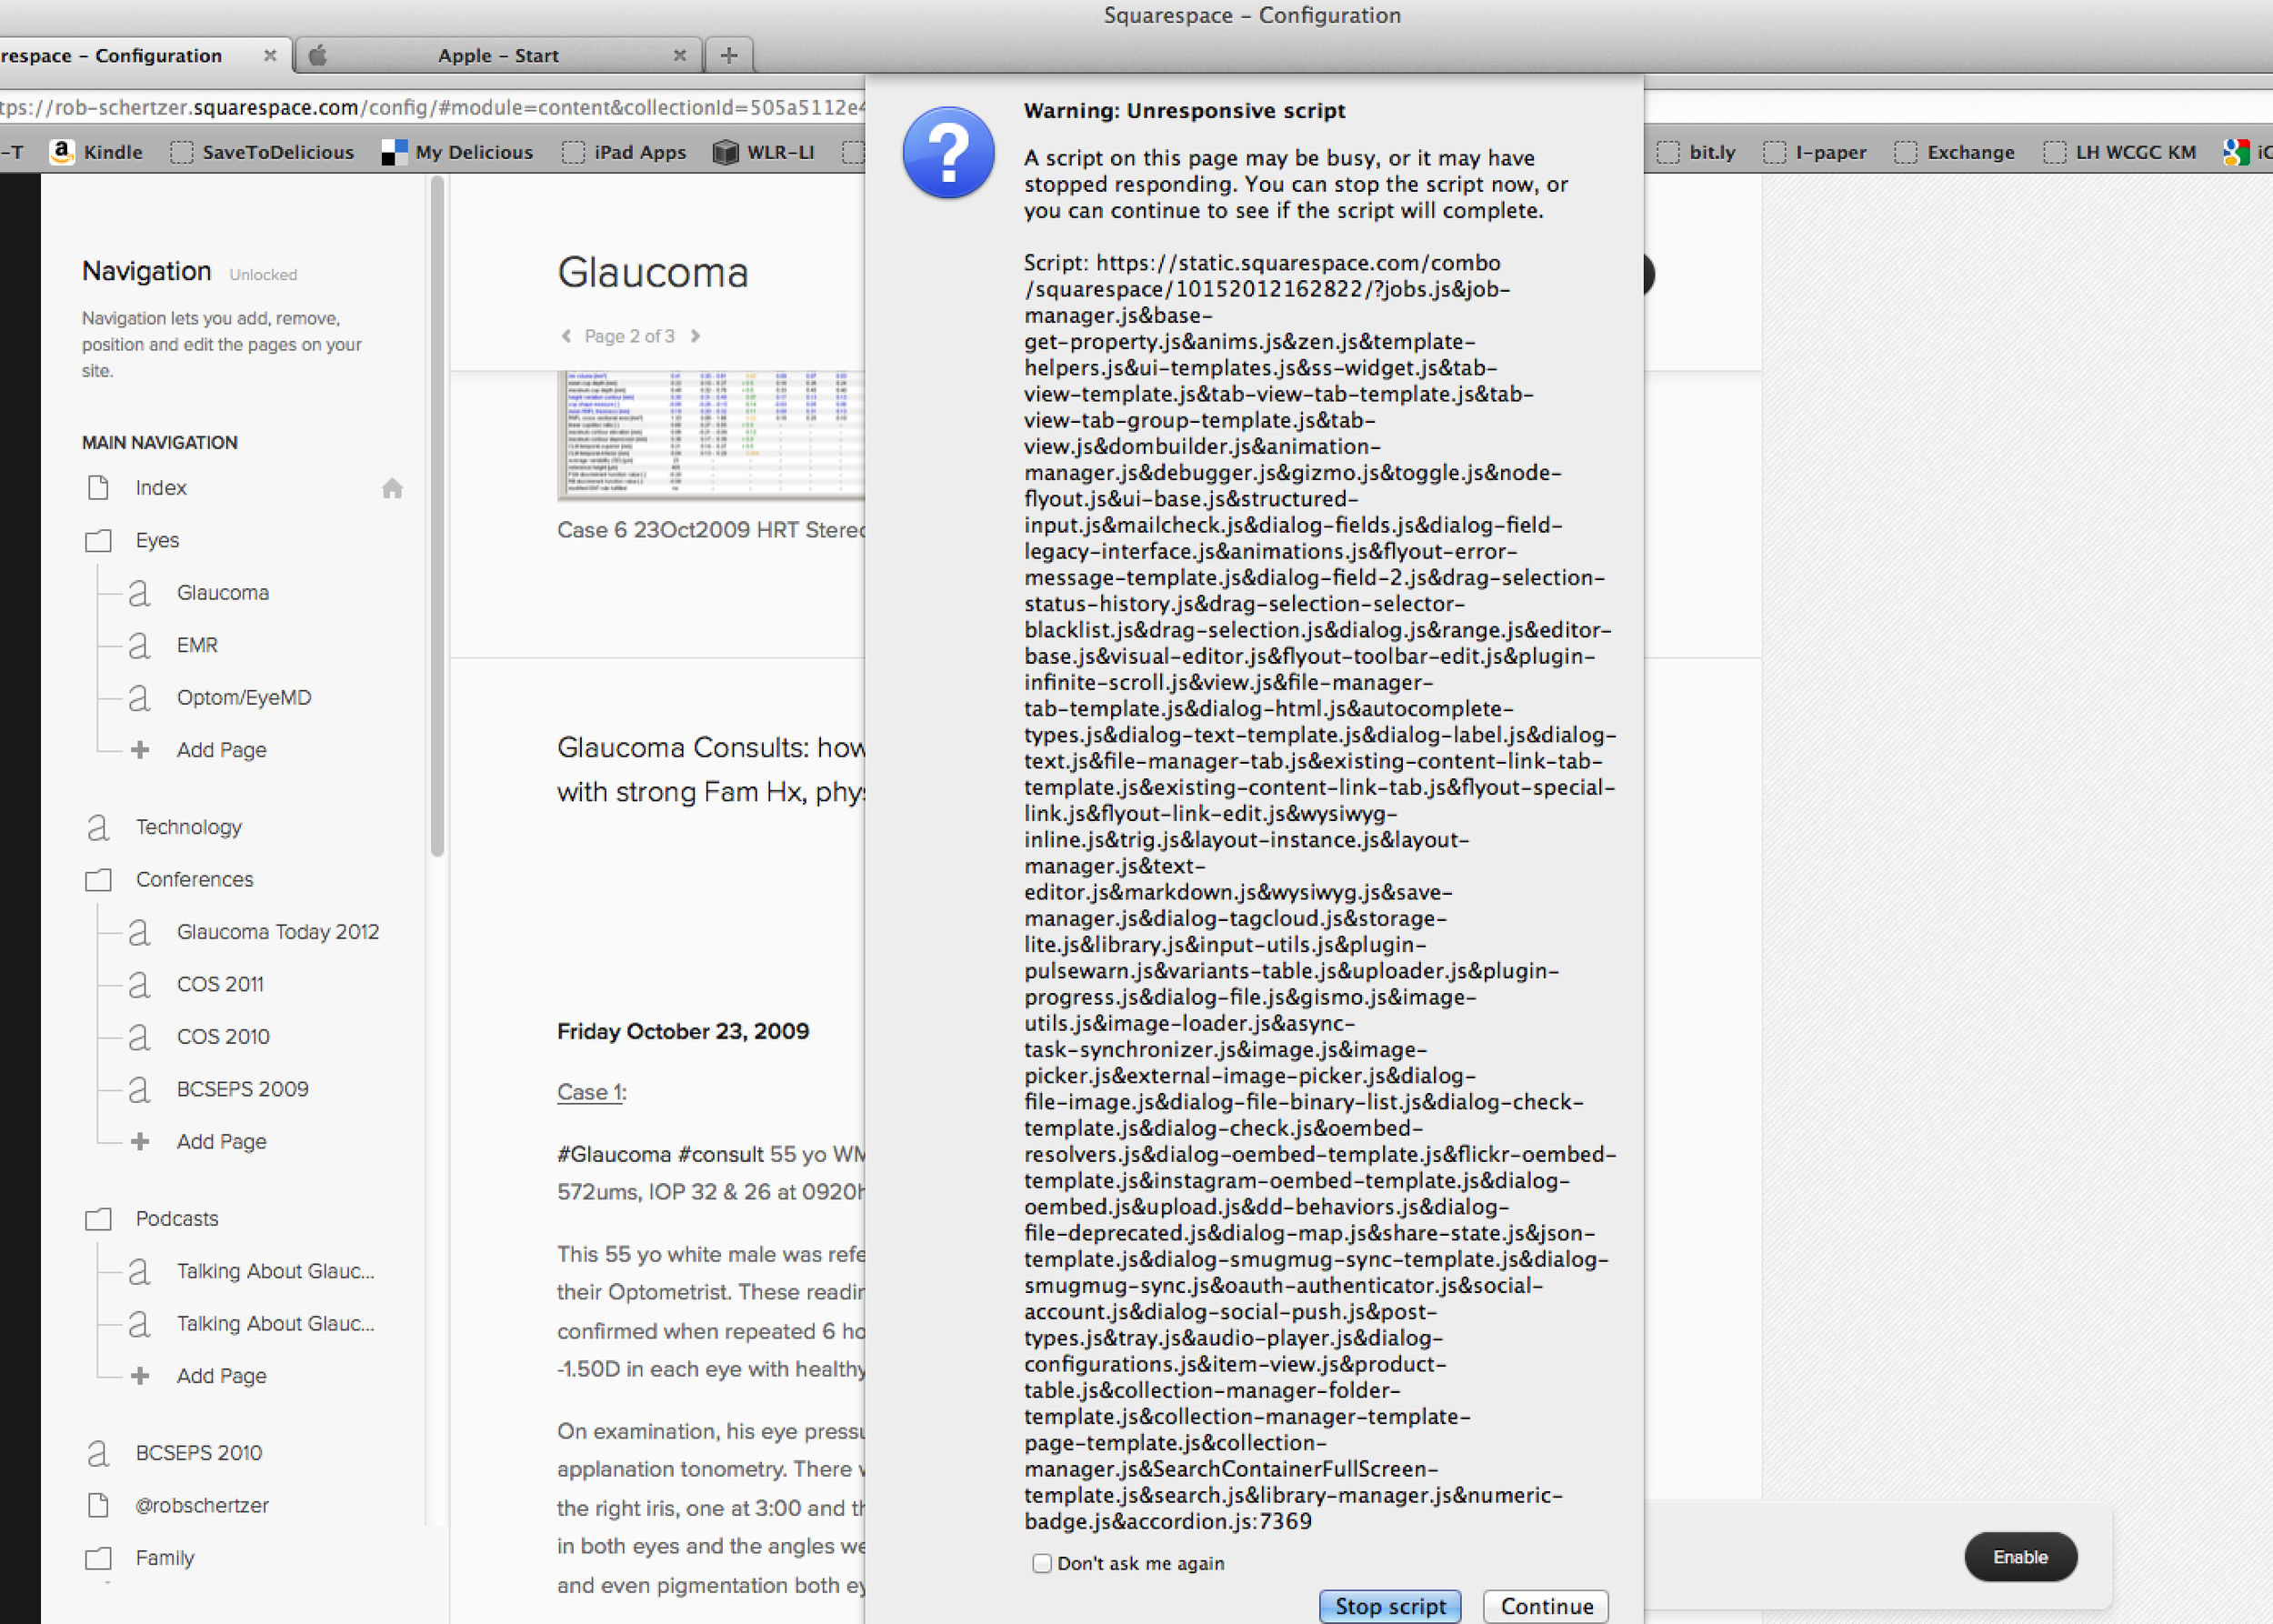 Sample Squaresapce script error